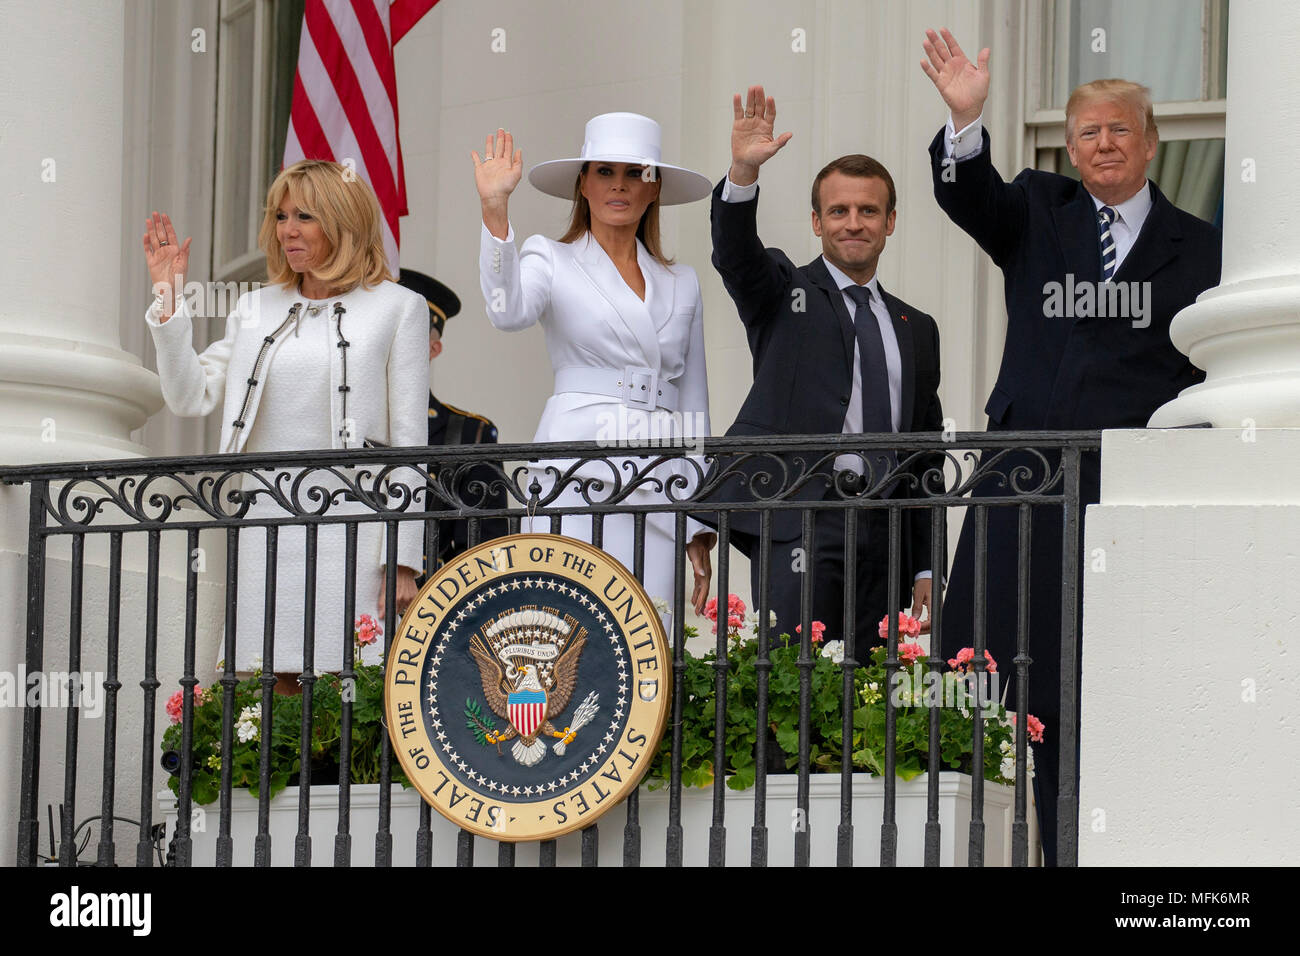 Washington, USA. 24th Apr, 2018. United States President Donald J ...